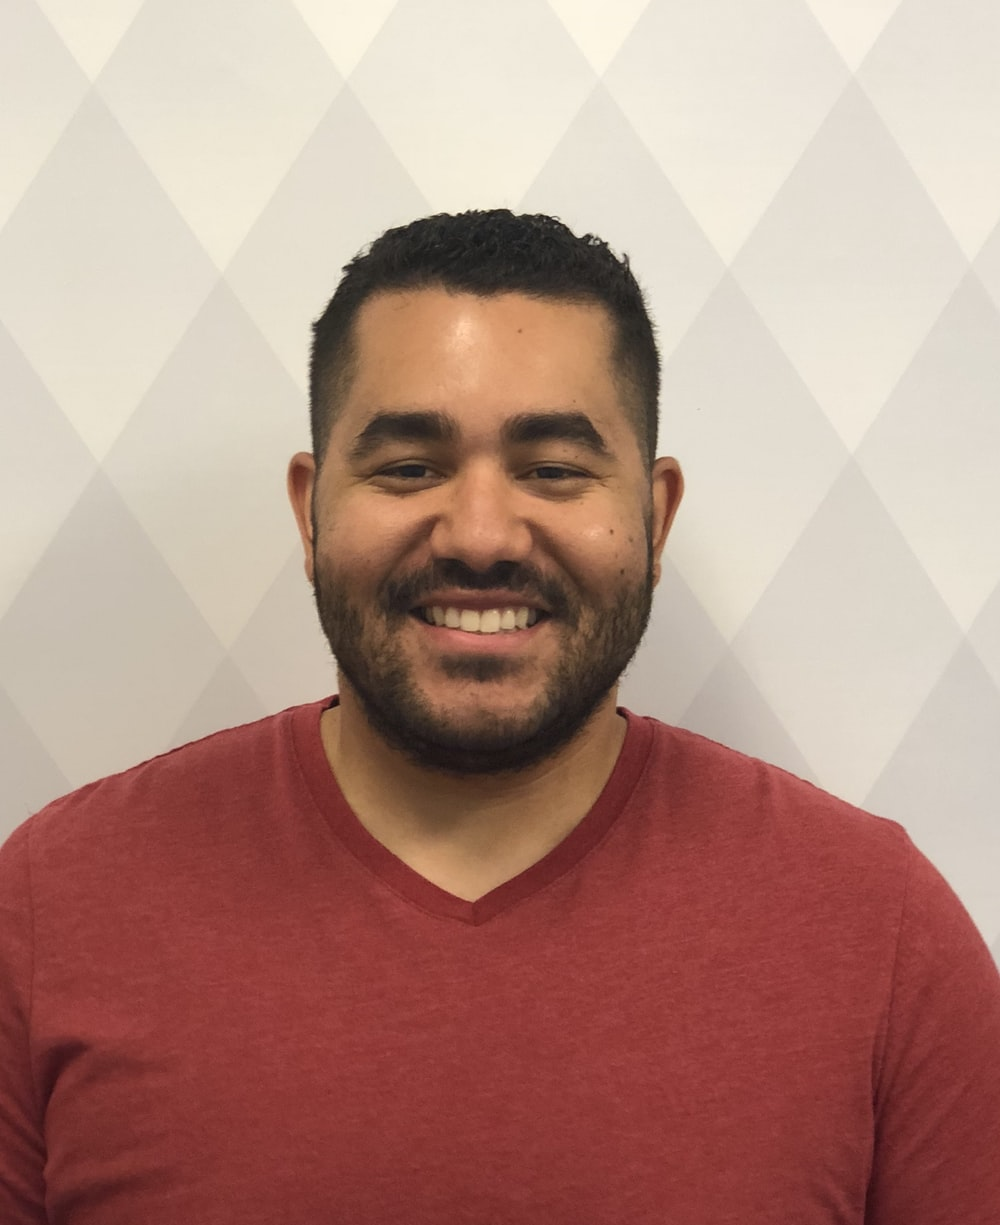 man smiling wearing maroon V-neck shirt